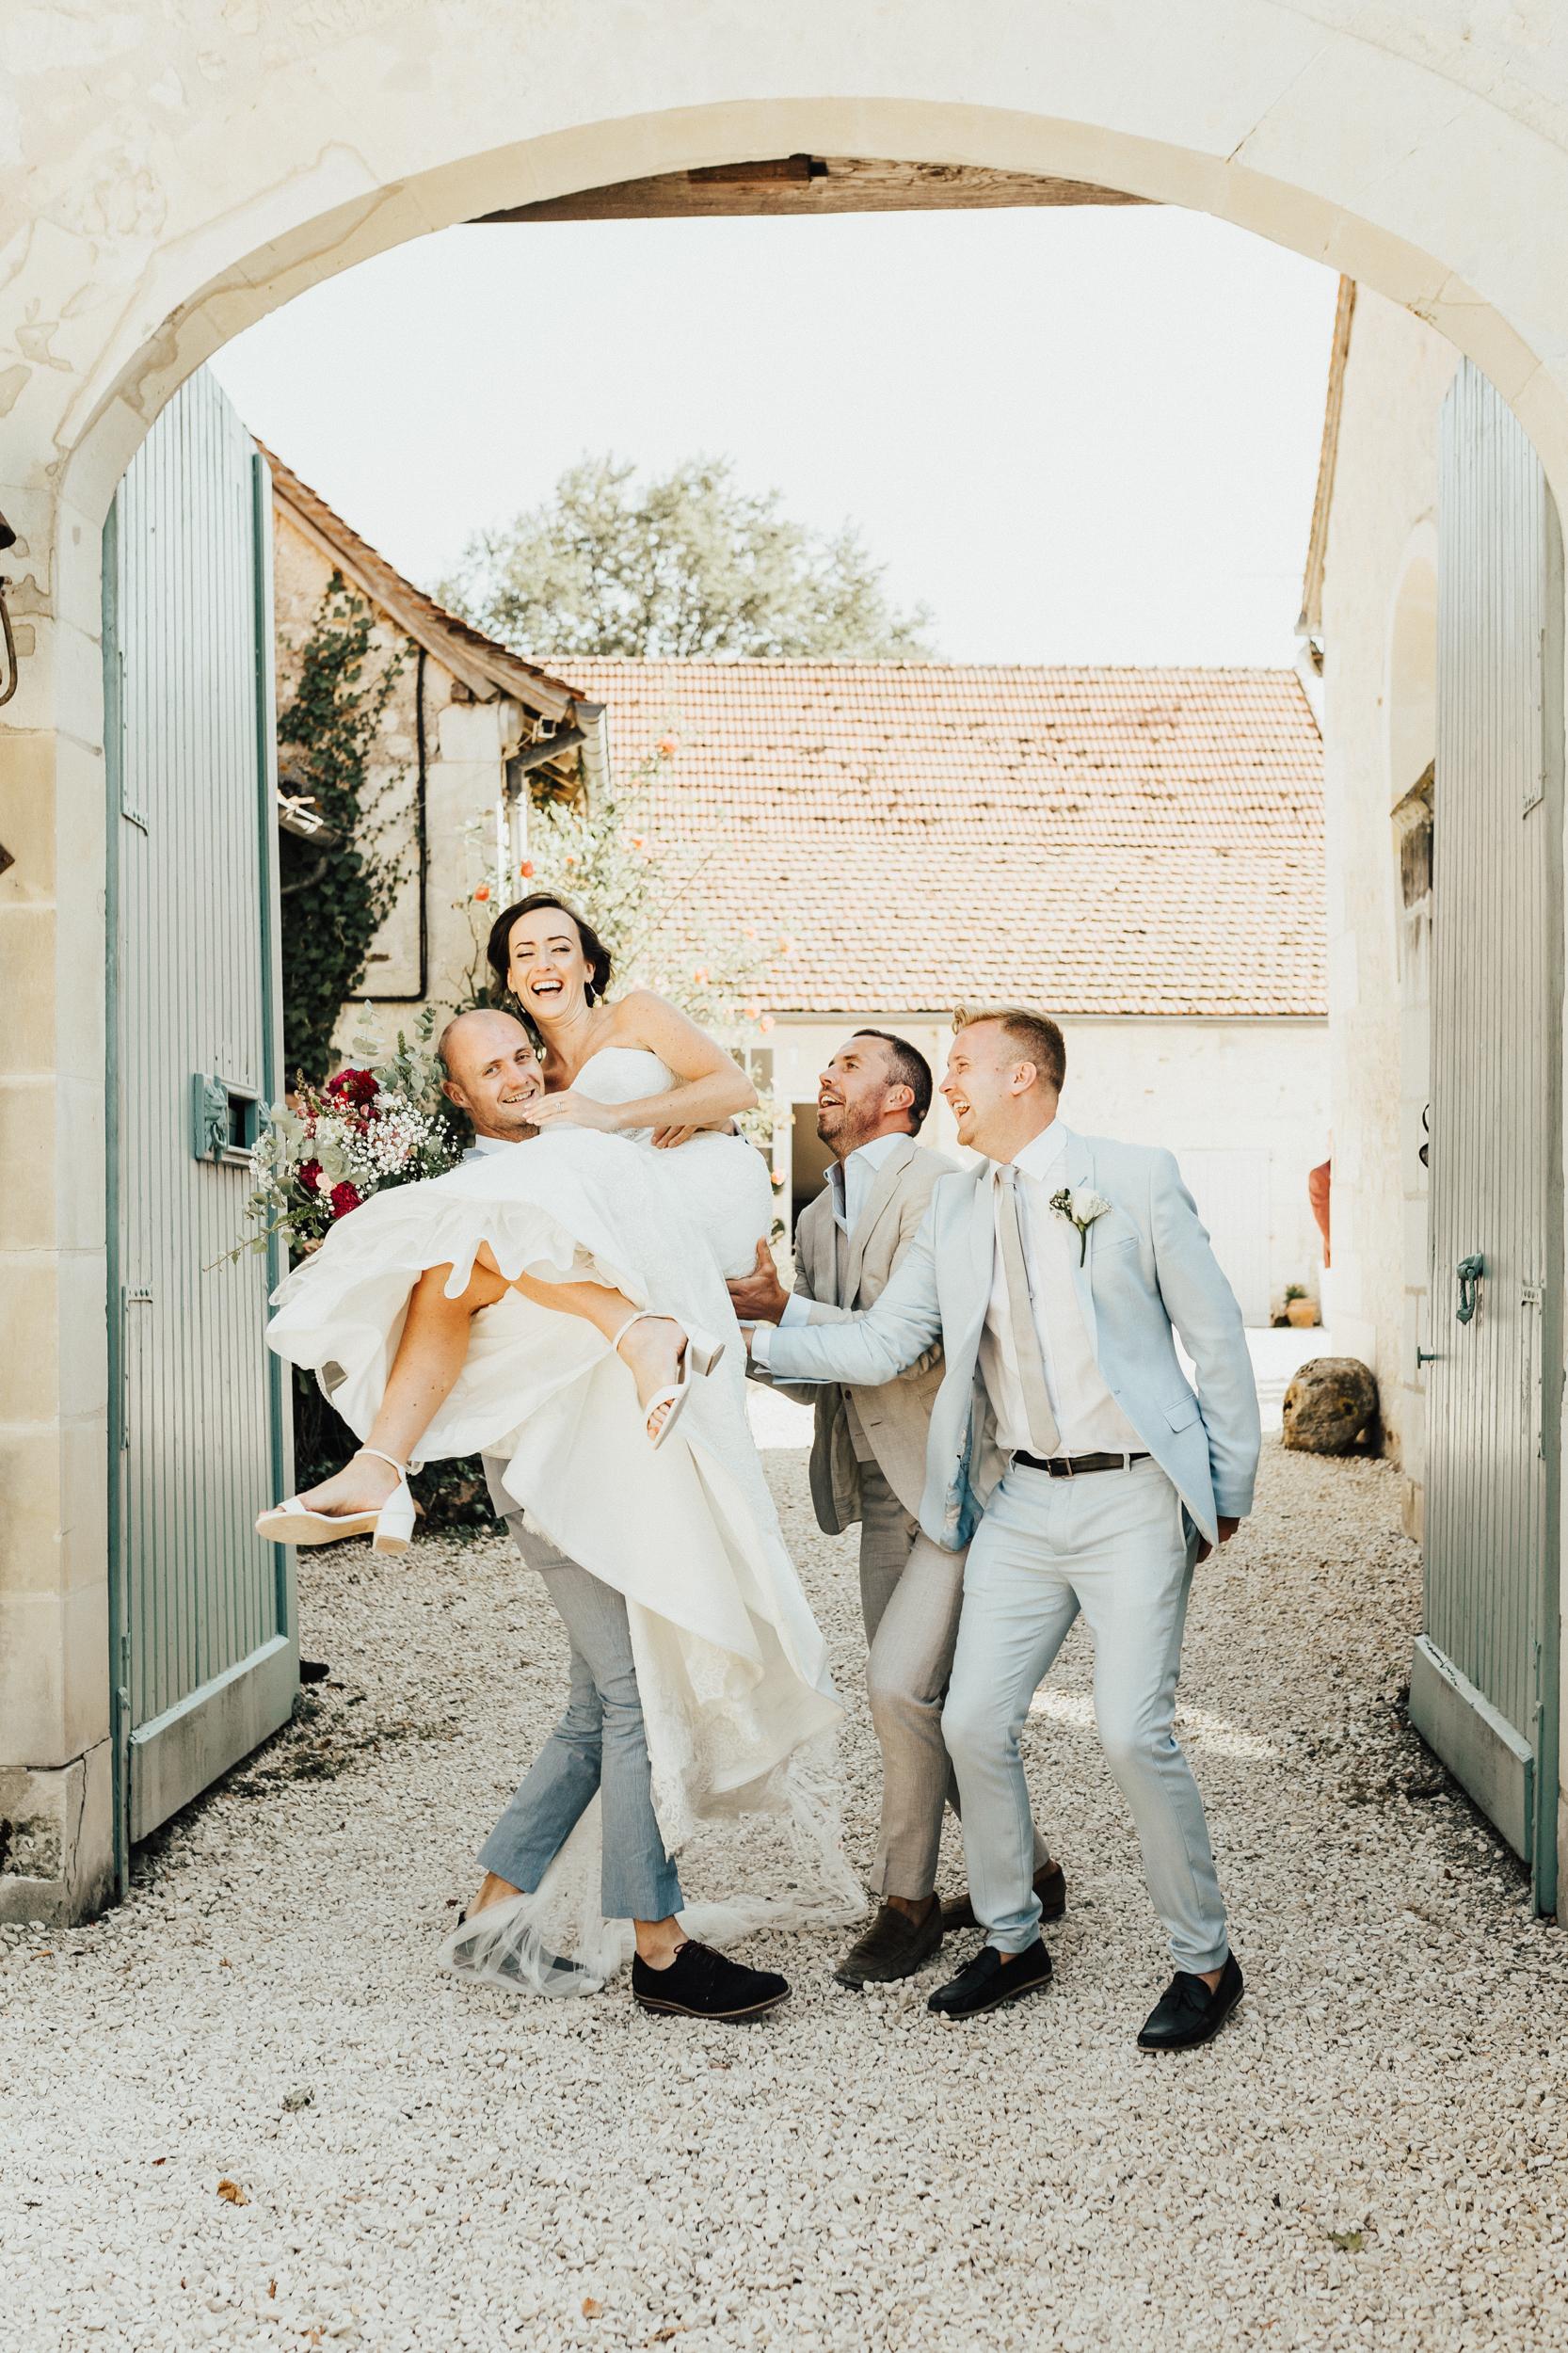 Amy-Zac-Destination-Wedding-France-Manoir-Foulquetiere-Darina-Stoda-Photography-58.jpg